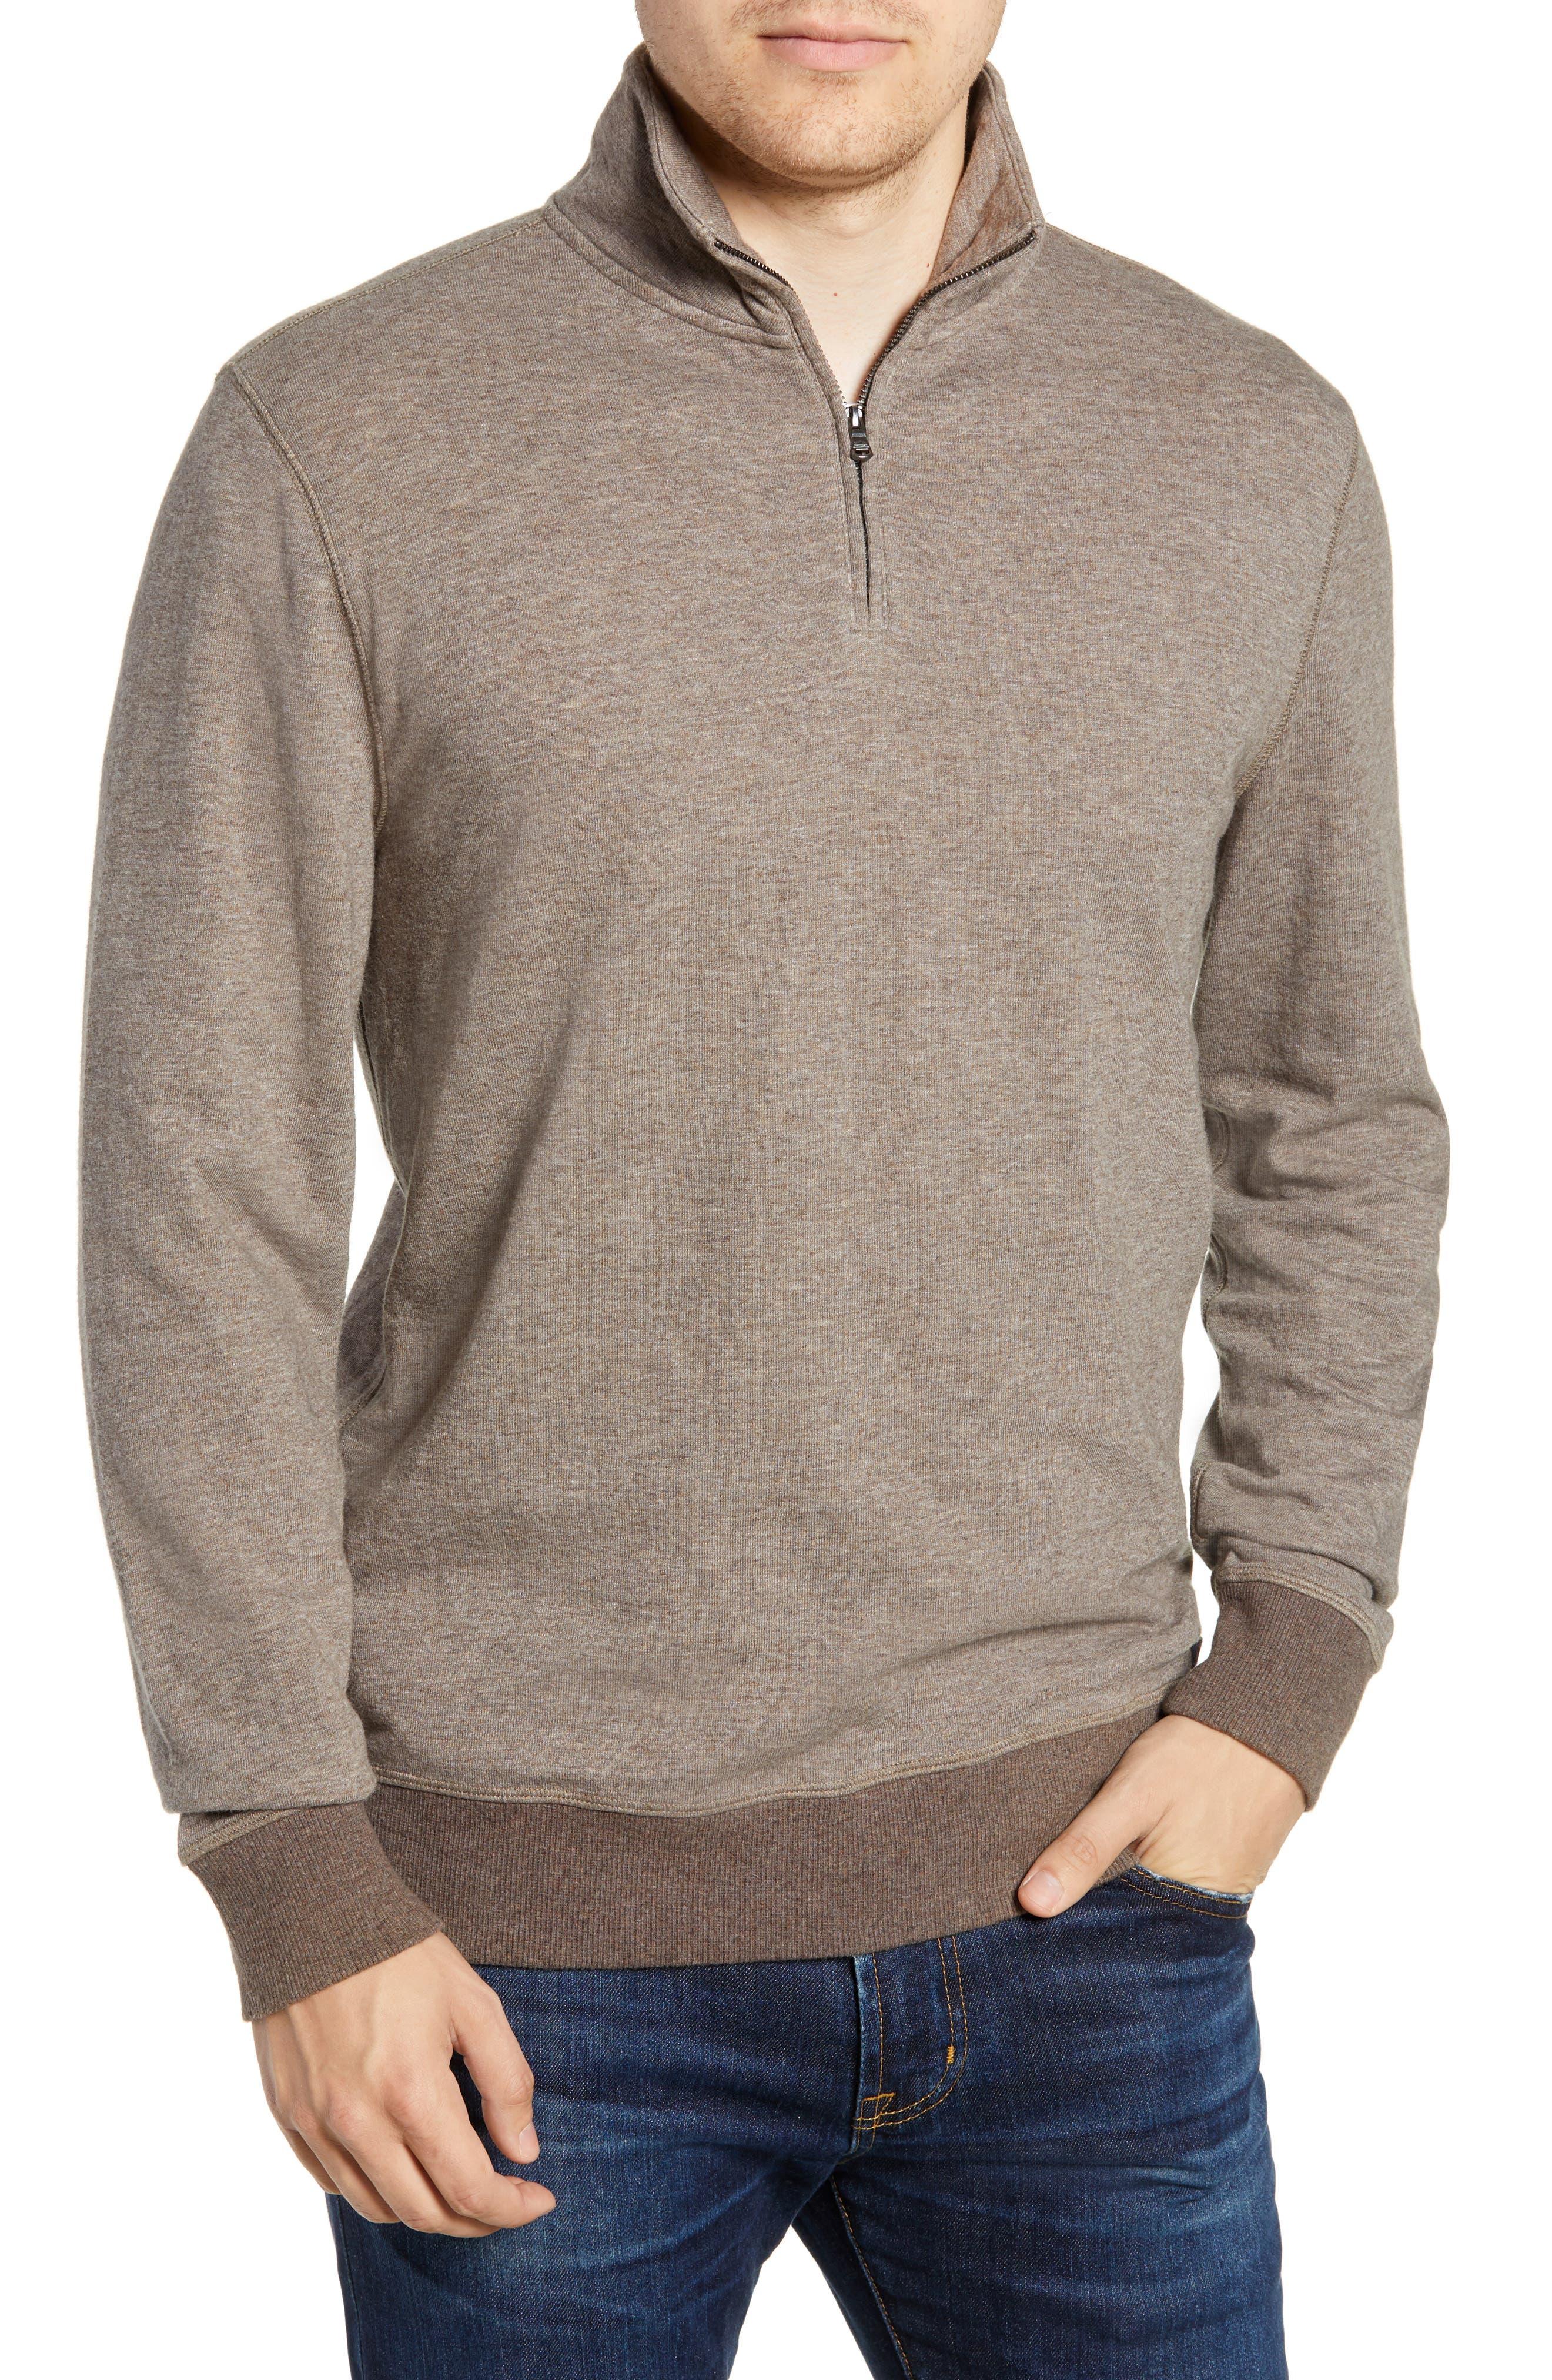 Dual Knit Regular Fit Quarter Zip Pullover,                             Main thumbnail 1, color,                             CHESTNUT